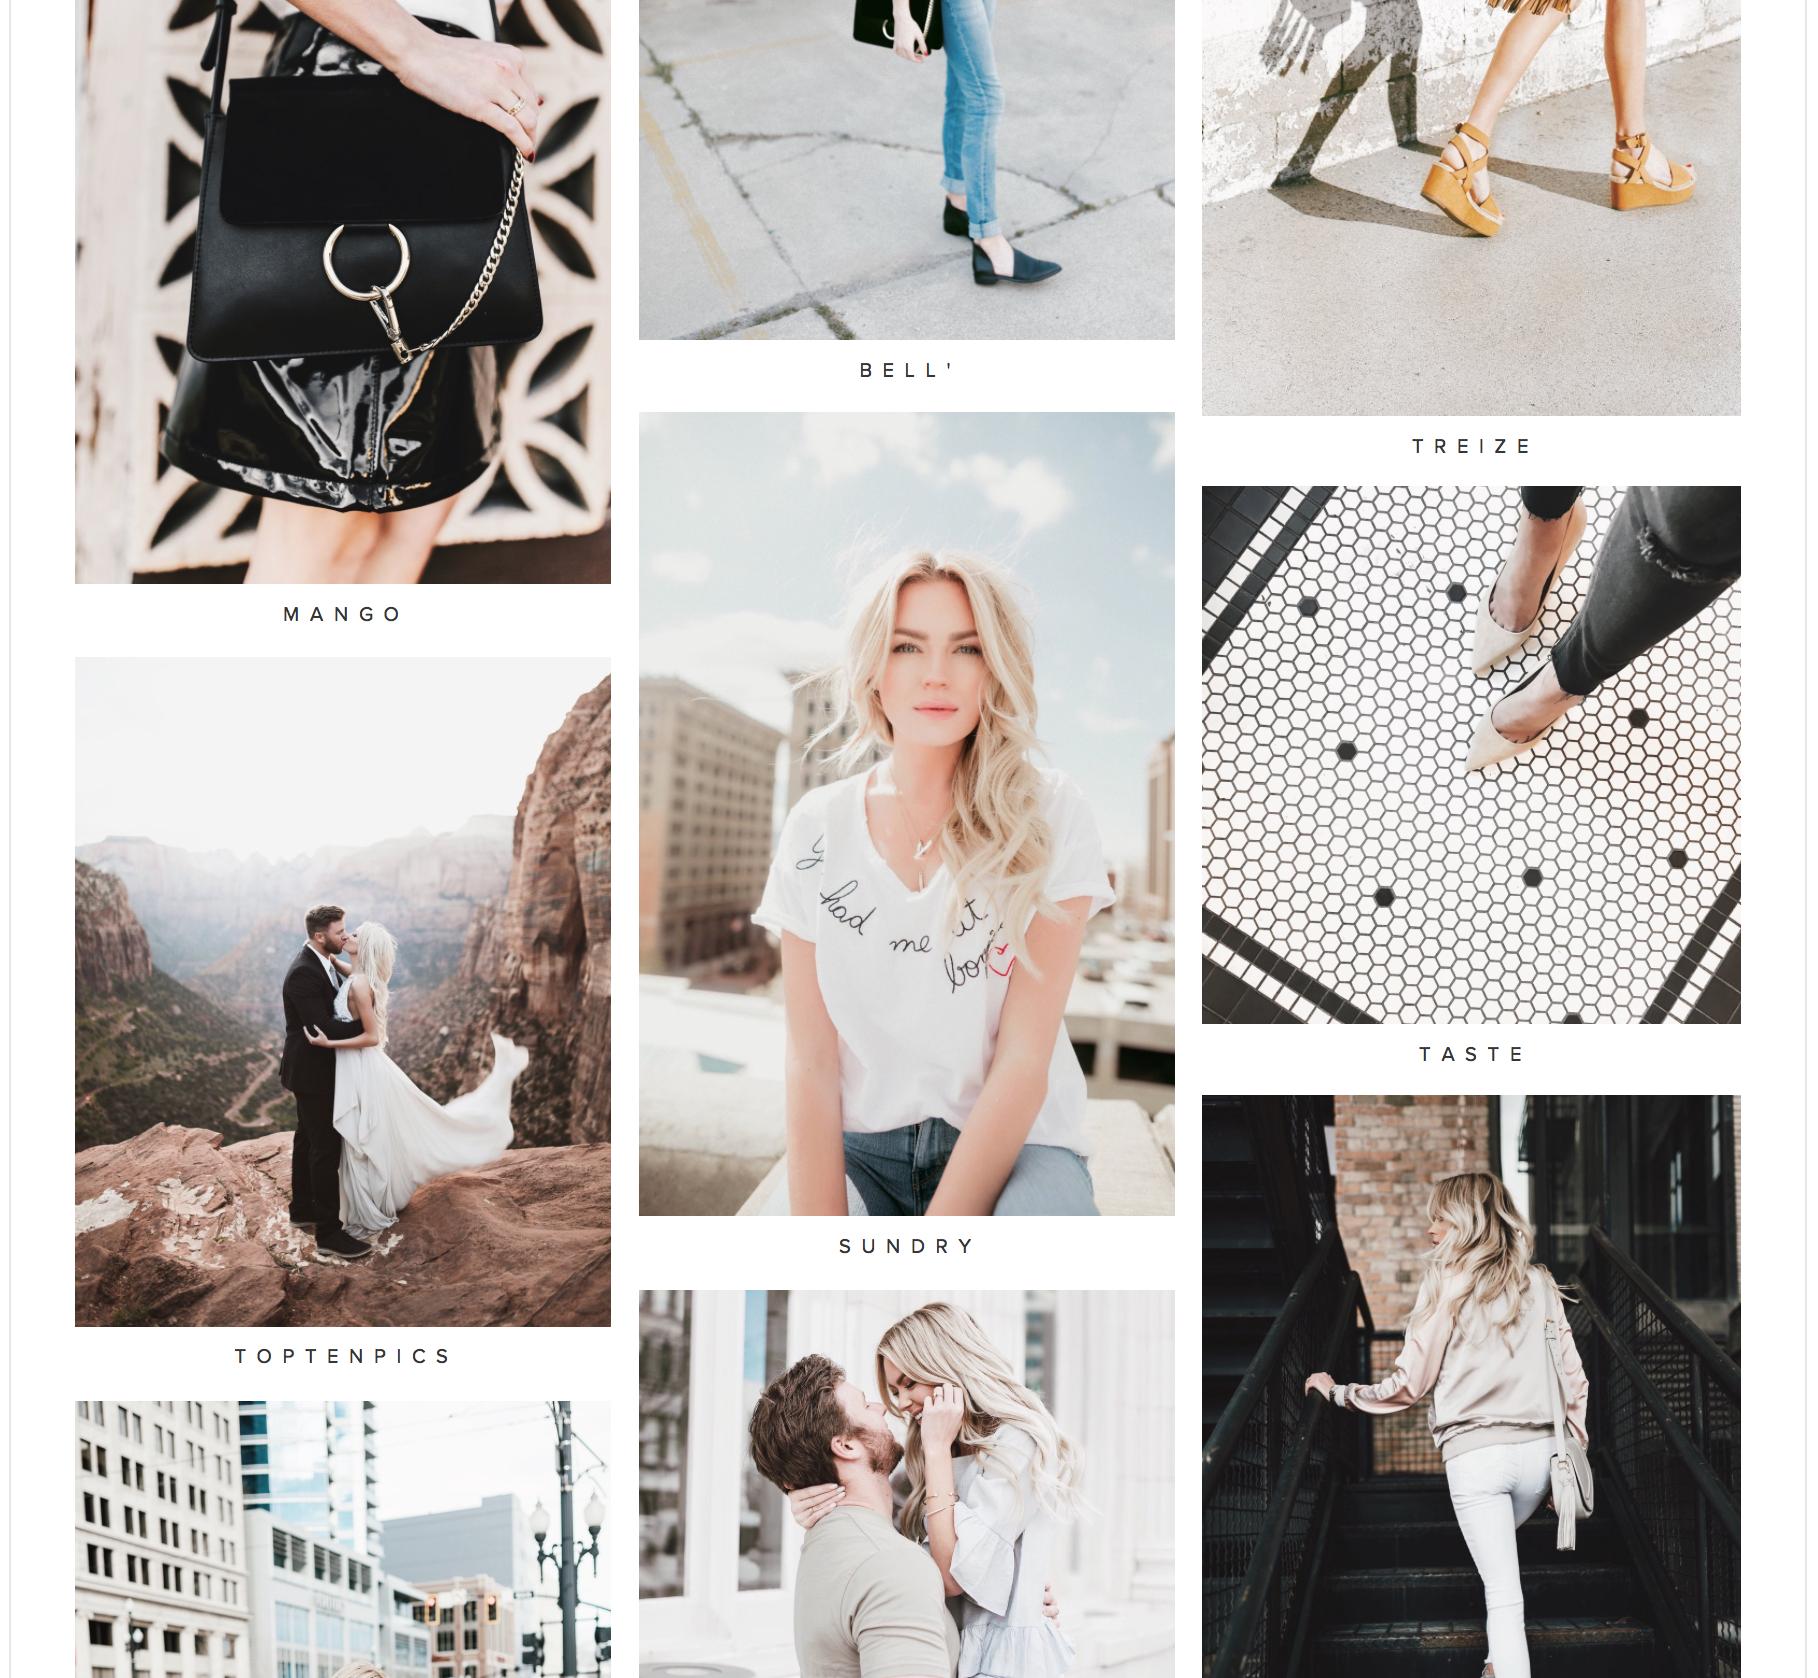 @happilyeverallen - BloggerFashion + Beauty Blog86.3k followers